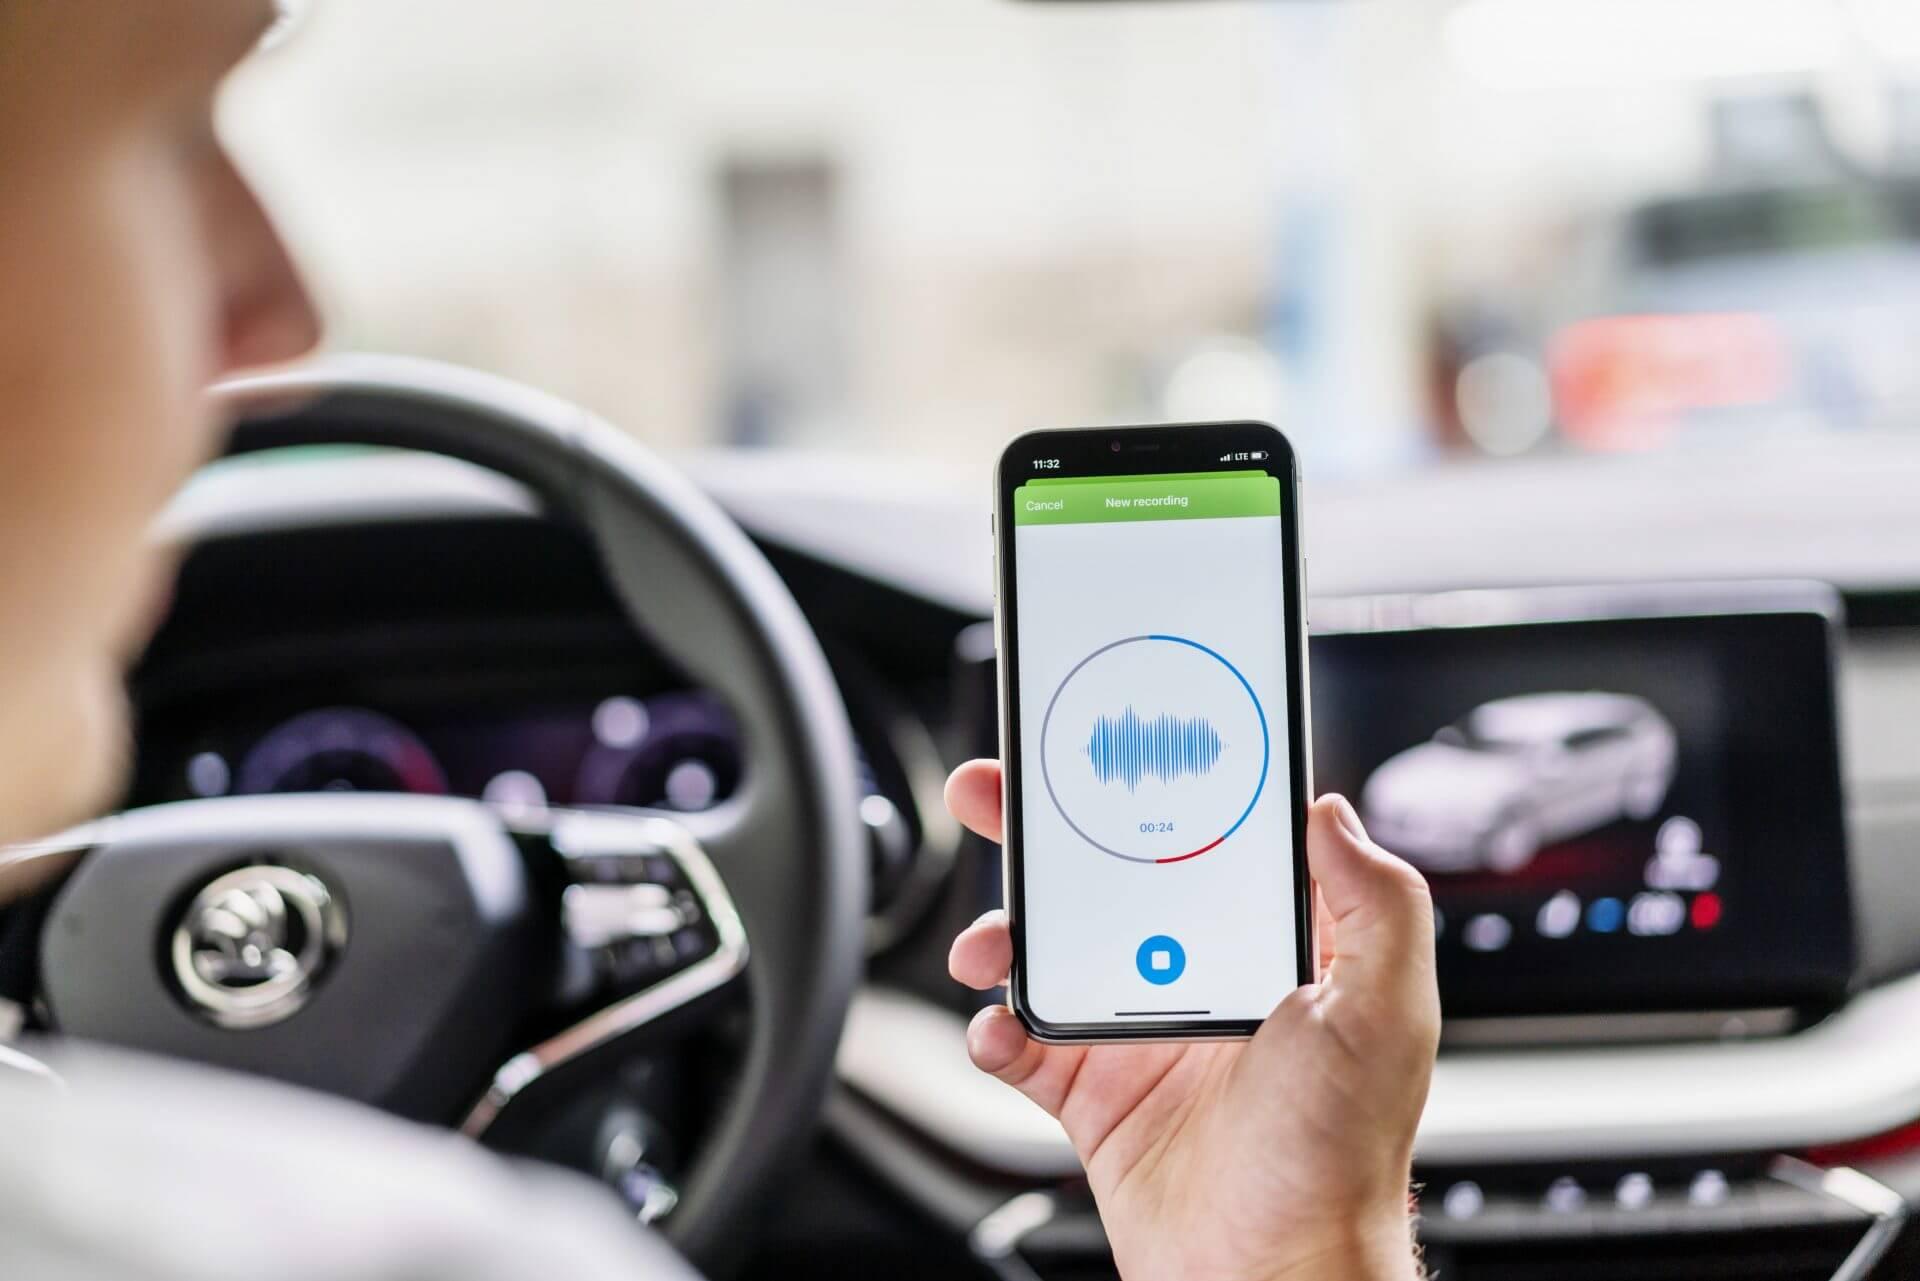 Skoda sound analyzer - Εφαρμογή που χρησιμοποιεί τεχνητή νοημοσύνη (AI) για τον εντοπισμό της απαίτησης για οποιαδήποτε συντήρηση